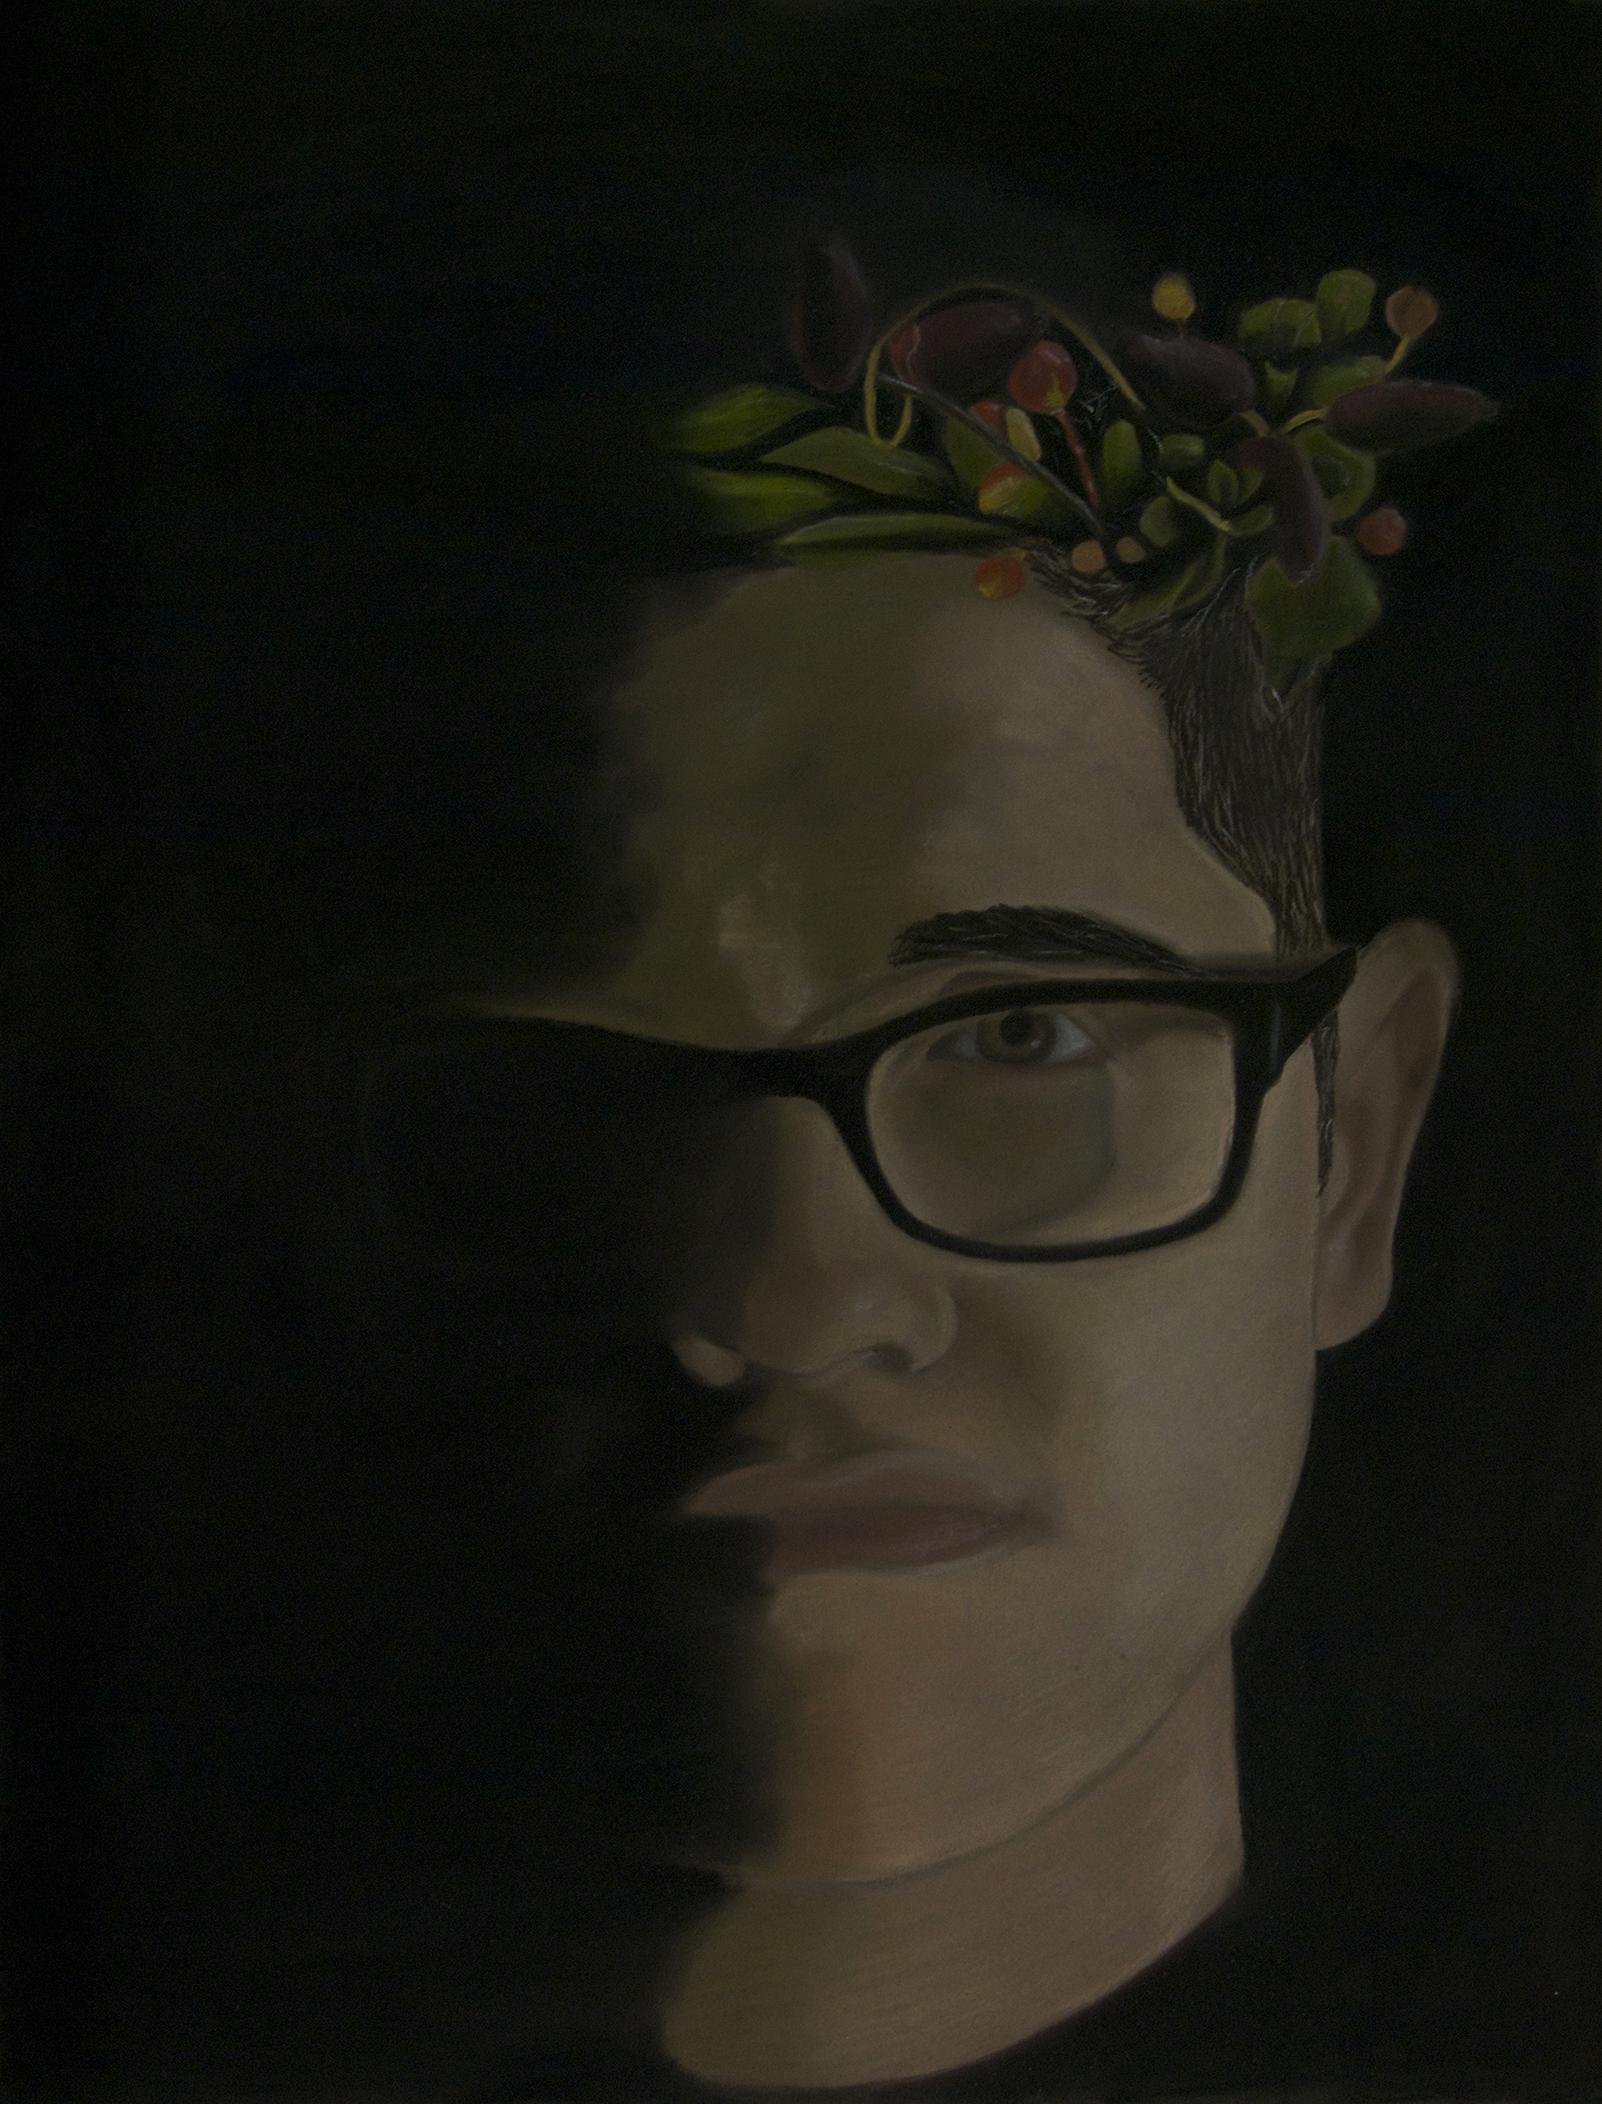 ICH, Pastellportrait Thomas Maier, Foto: T. Maier